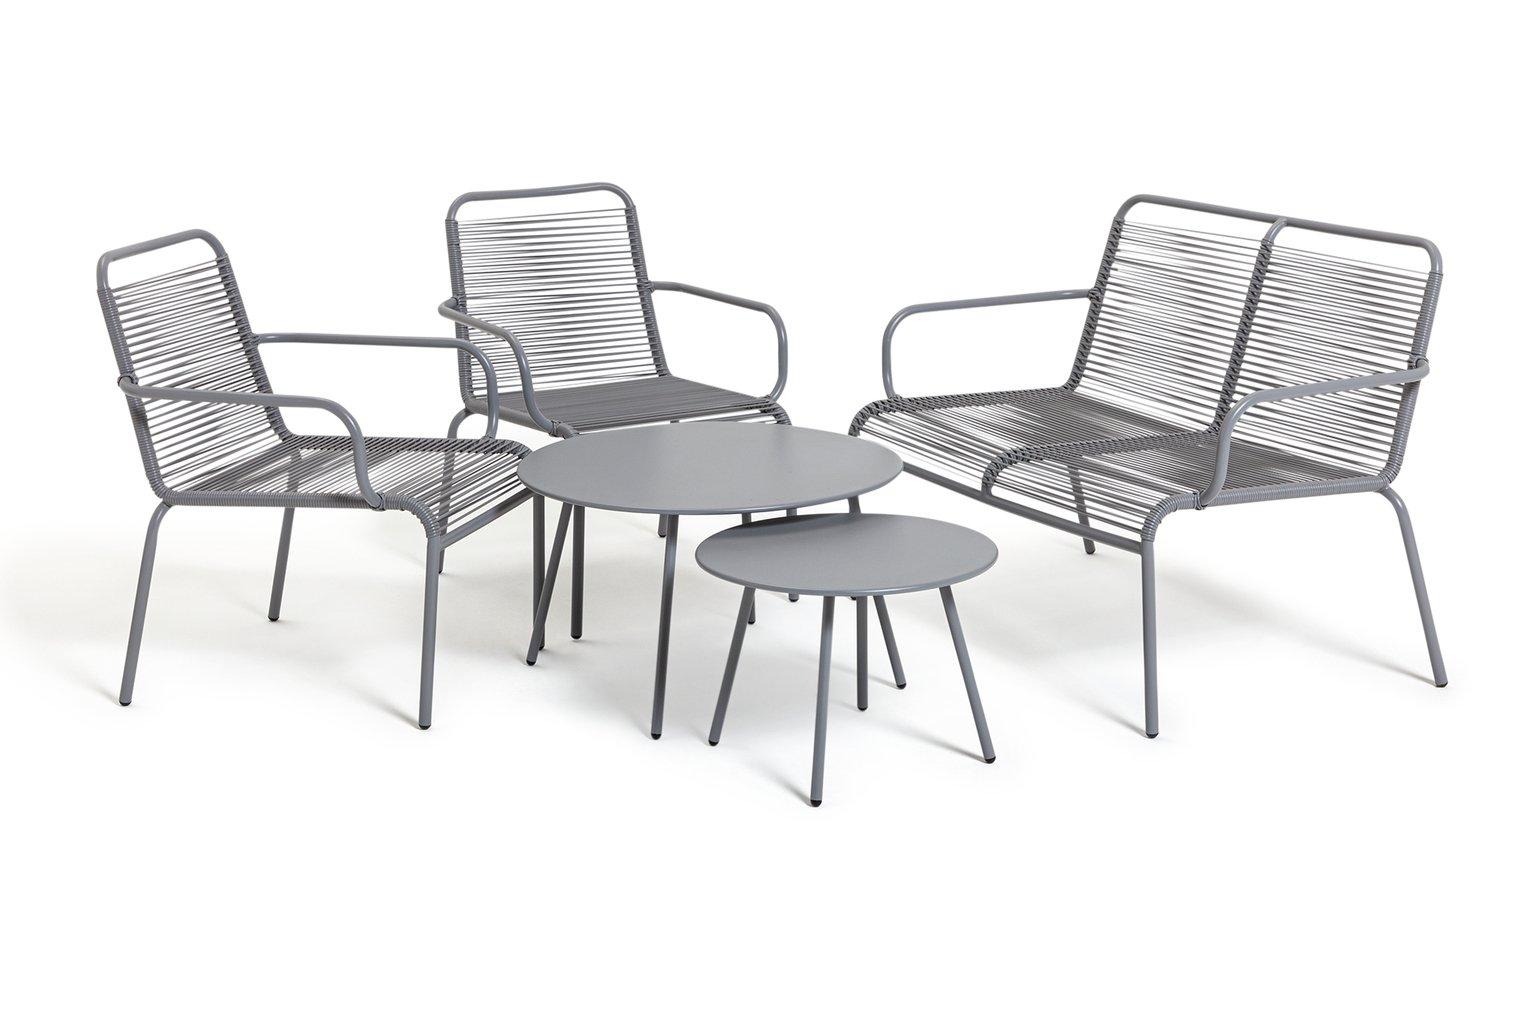 Habitat Ipanema 4 Seater Sofa Set - Grey